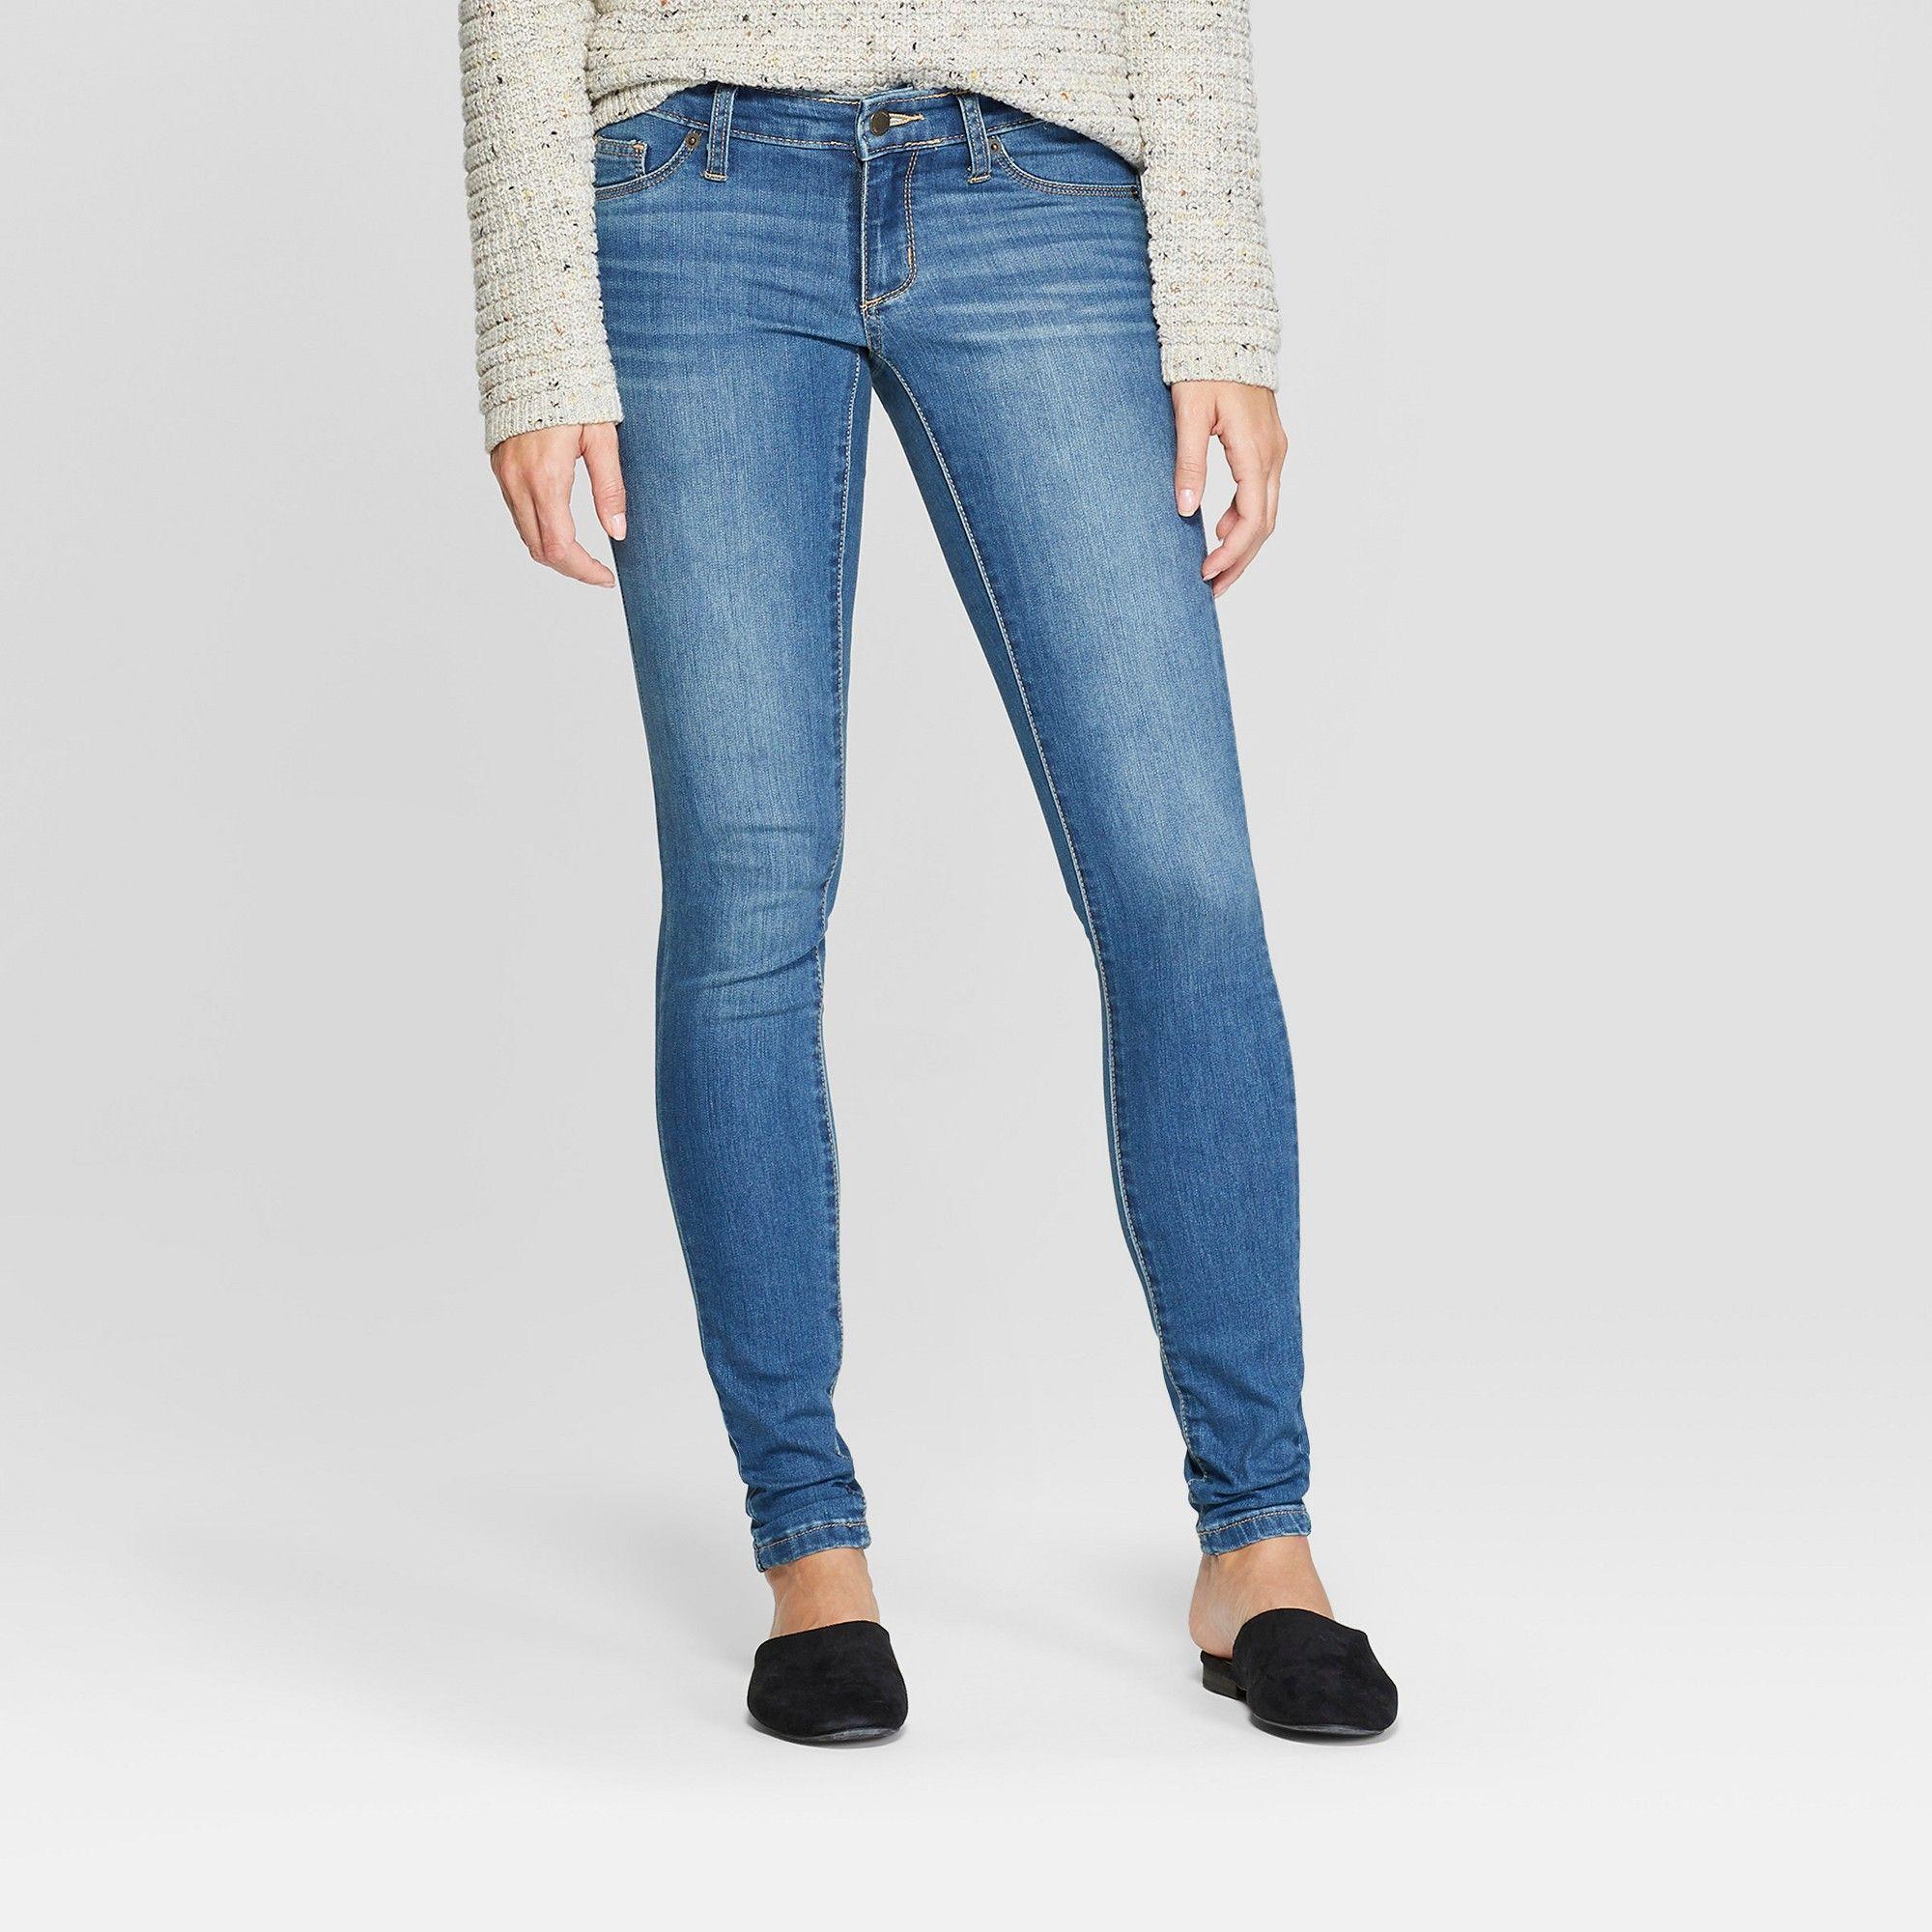 ae7156f5f23524 Women's Low-Rise Jeggings - Universal Thread Medium Wash 00 Short, Blue